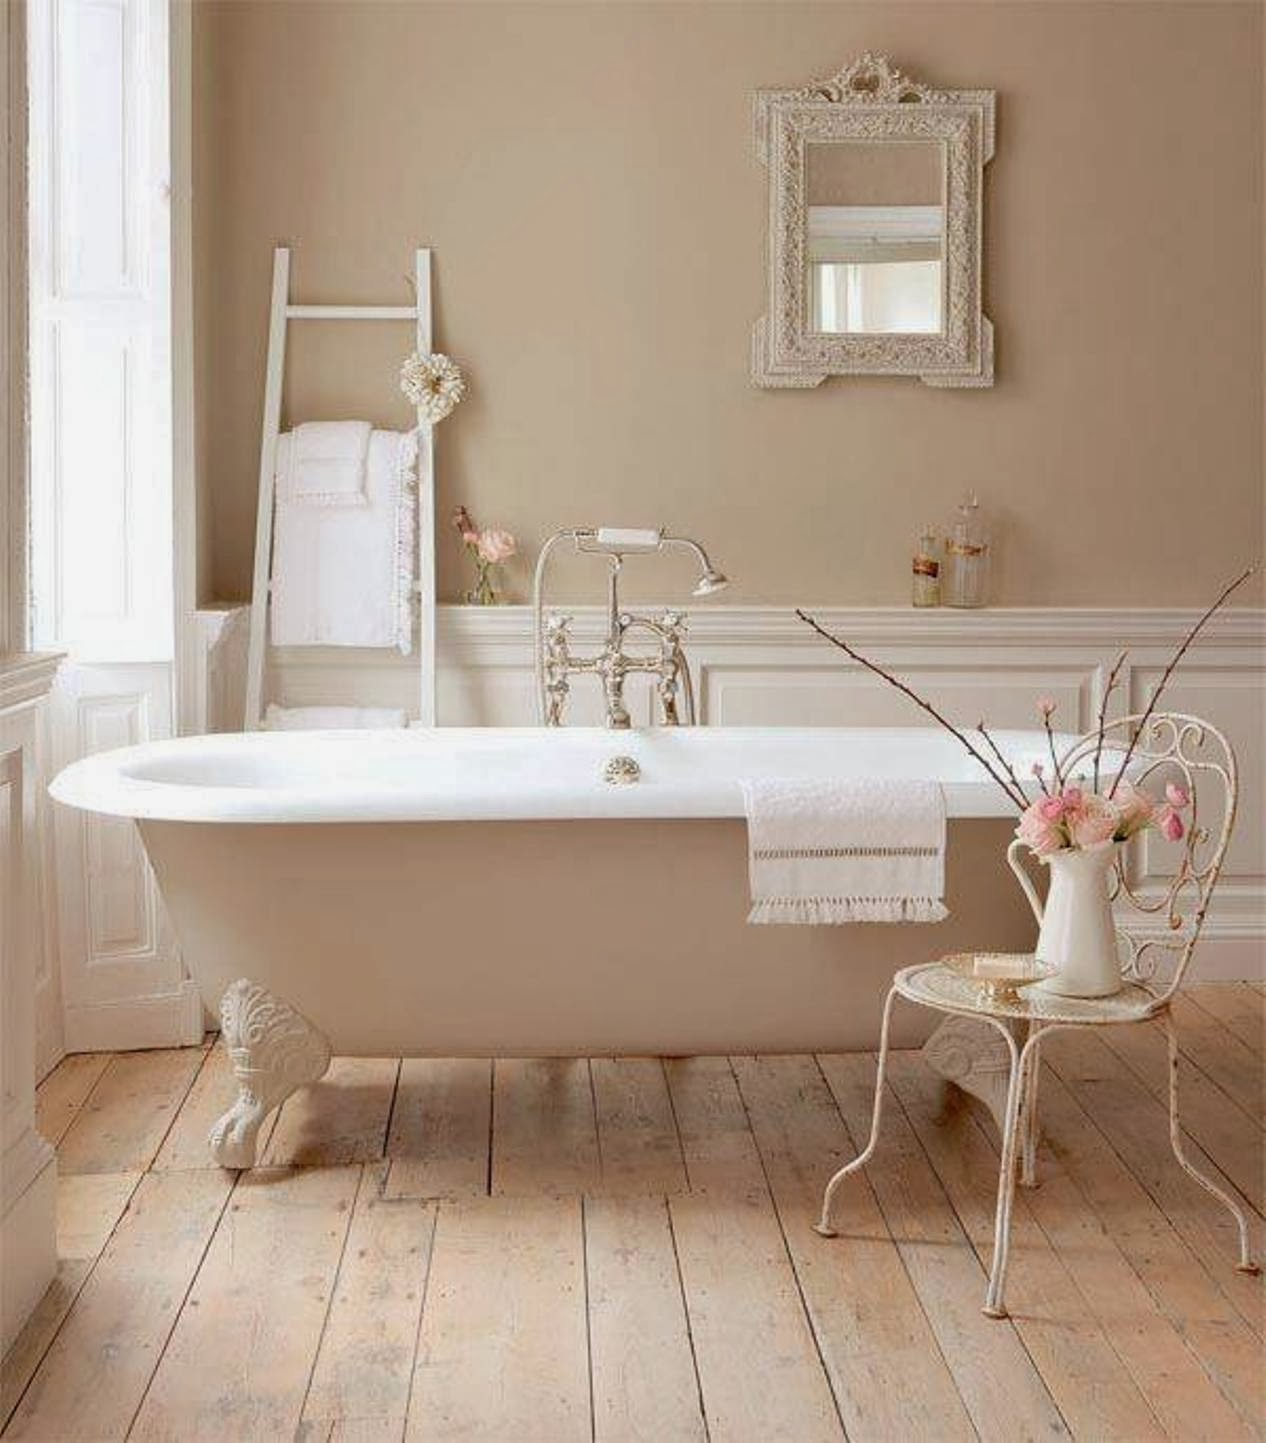 vasche creativo bagno da Shabby : vasca da bagno con scala - Arredamento Shabby